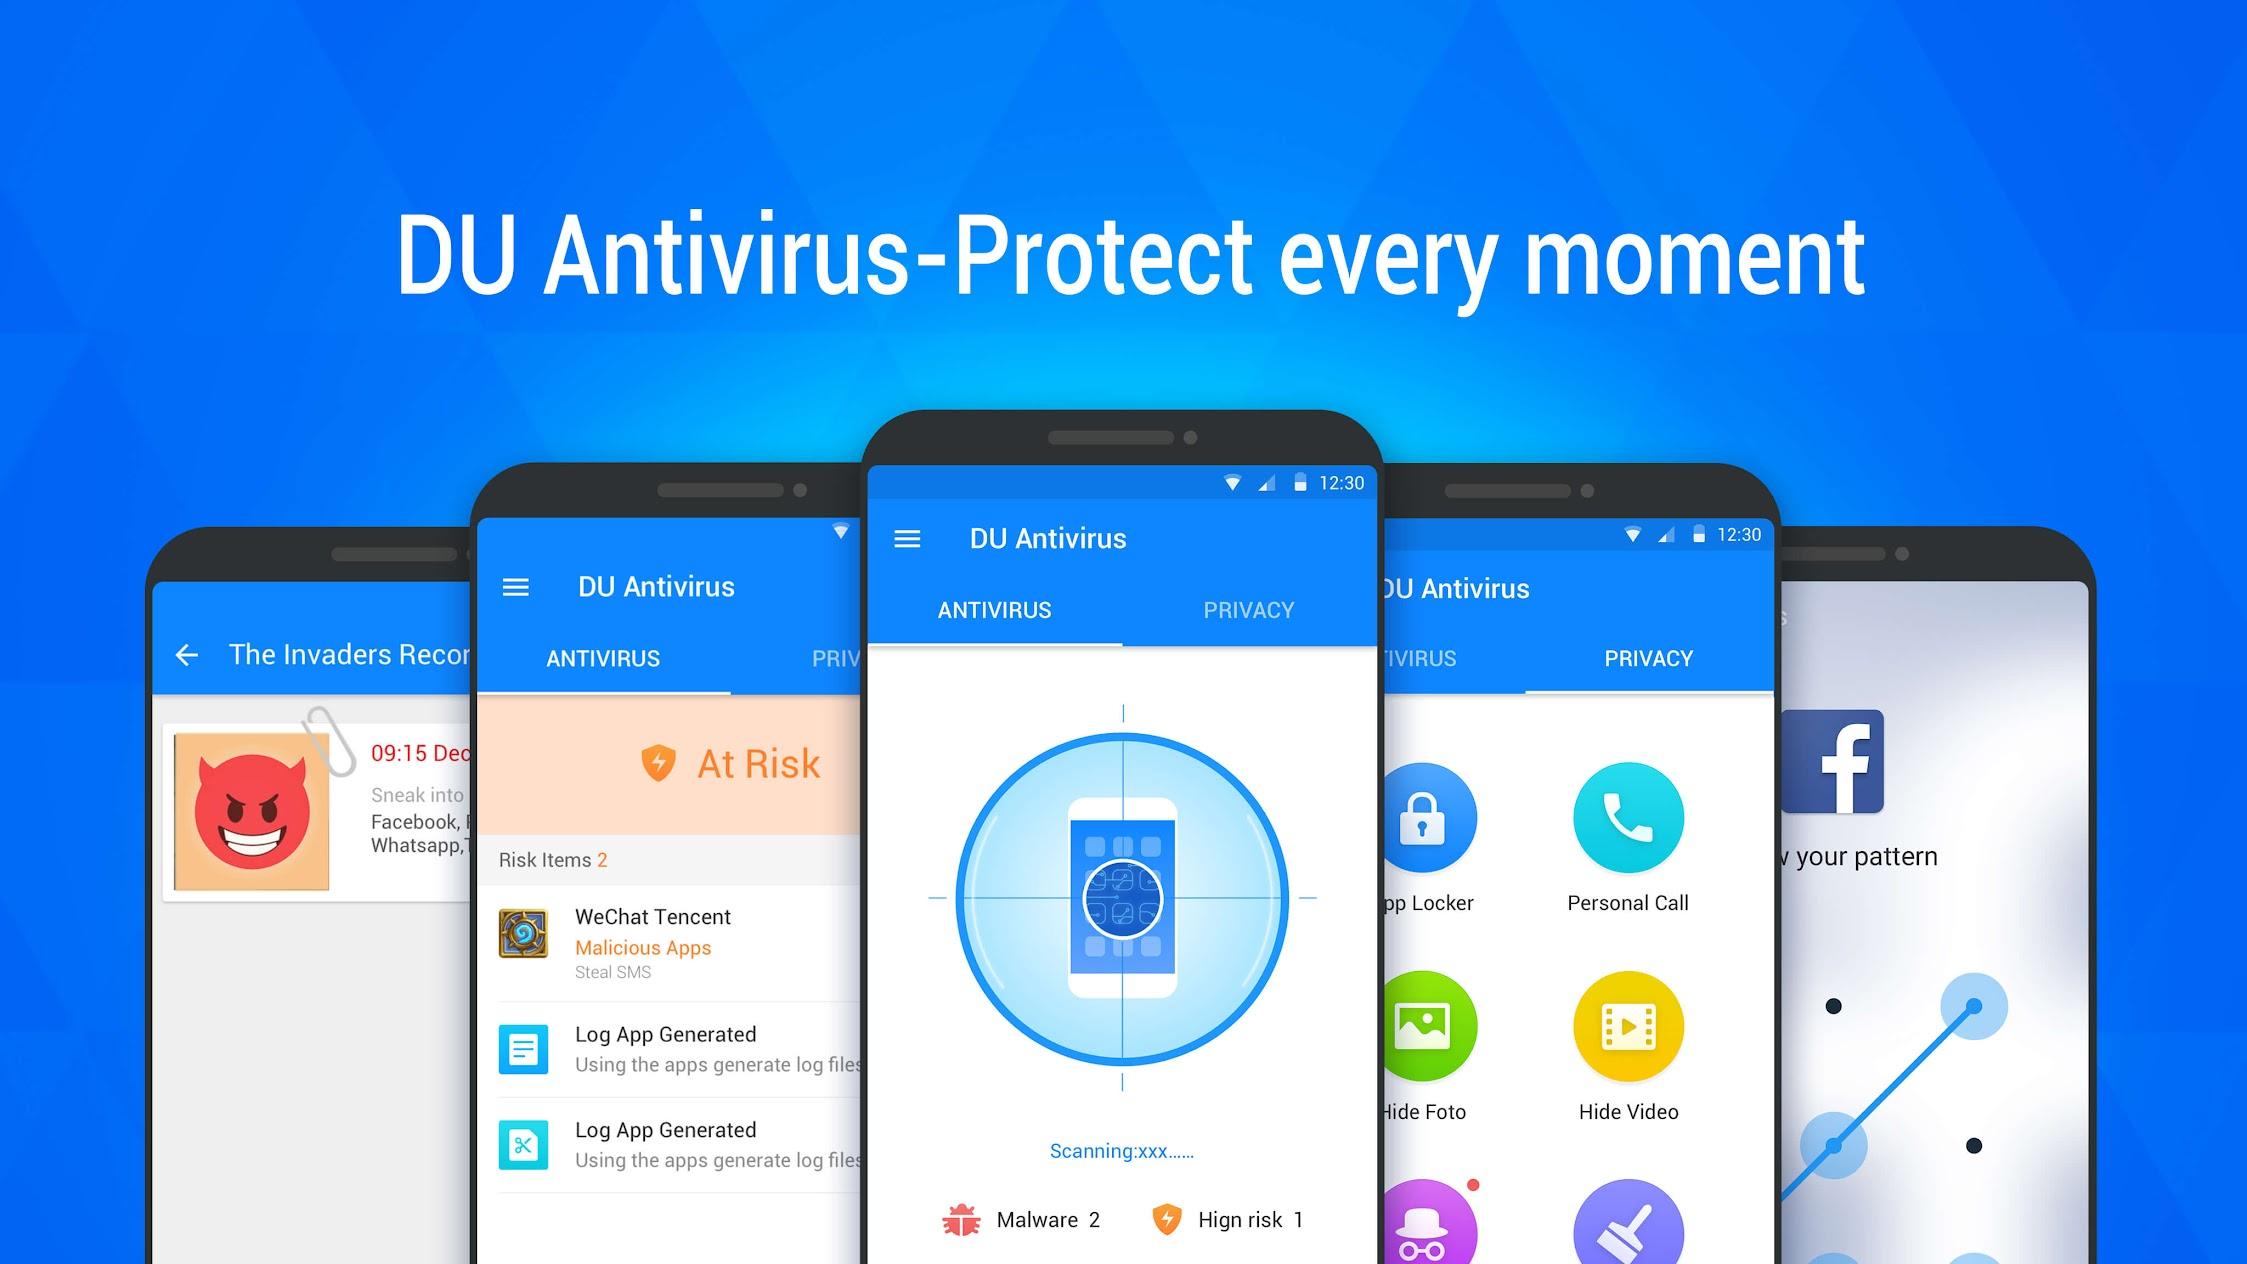 DU Antivirus - Mobile Securitys & AppLock